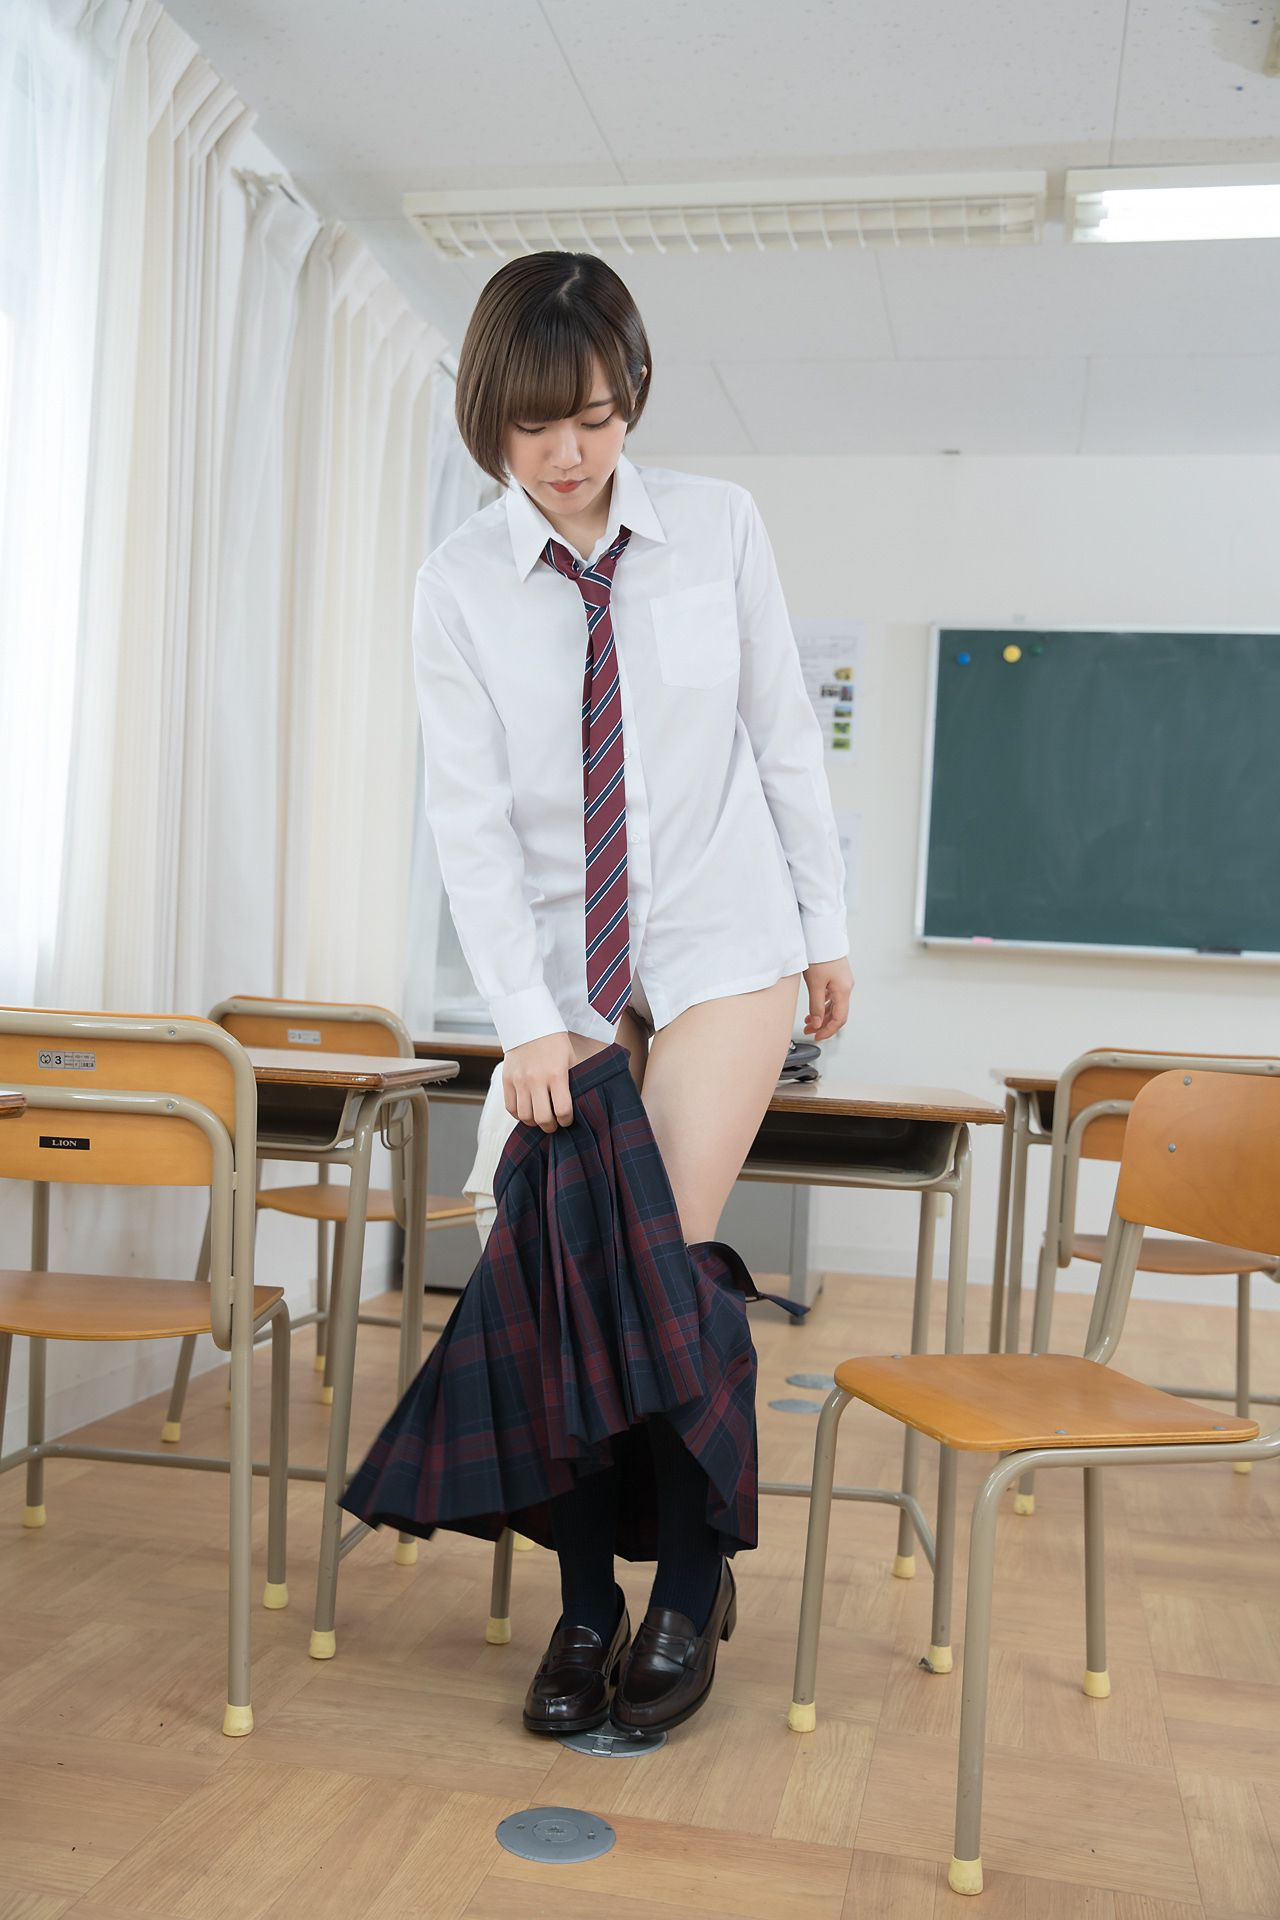 VOL.632 [Minisuka.tv]学生装:香月杏珠(香月りお)超高清写真套图(40P)